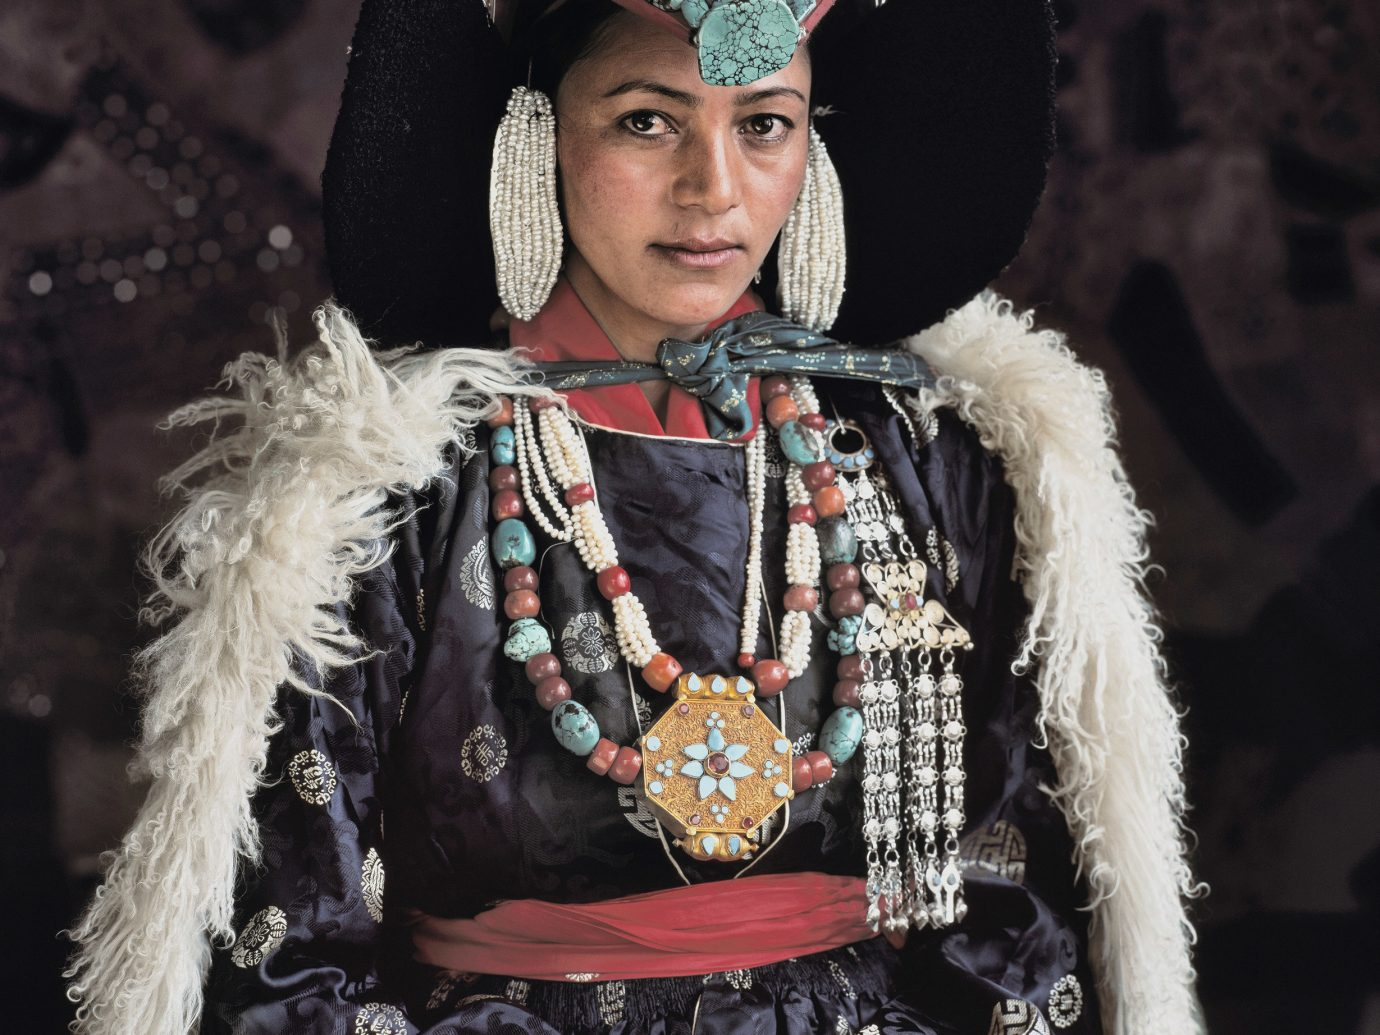 Arts + Culture fashion costume dressed